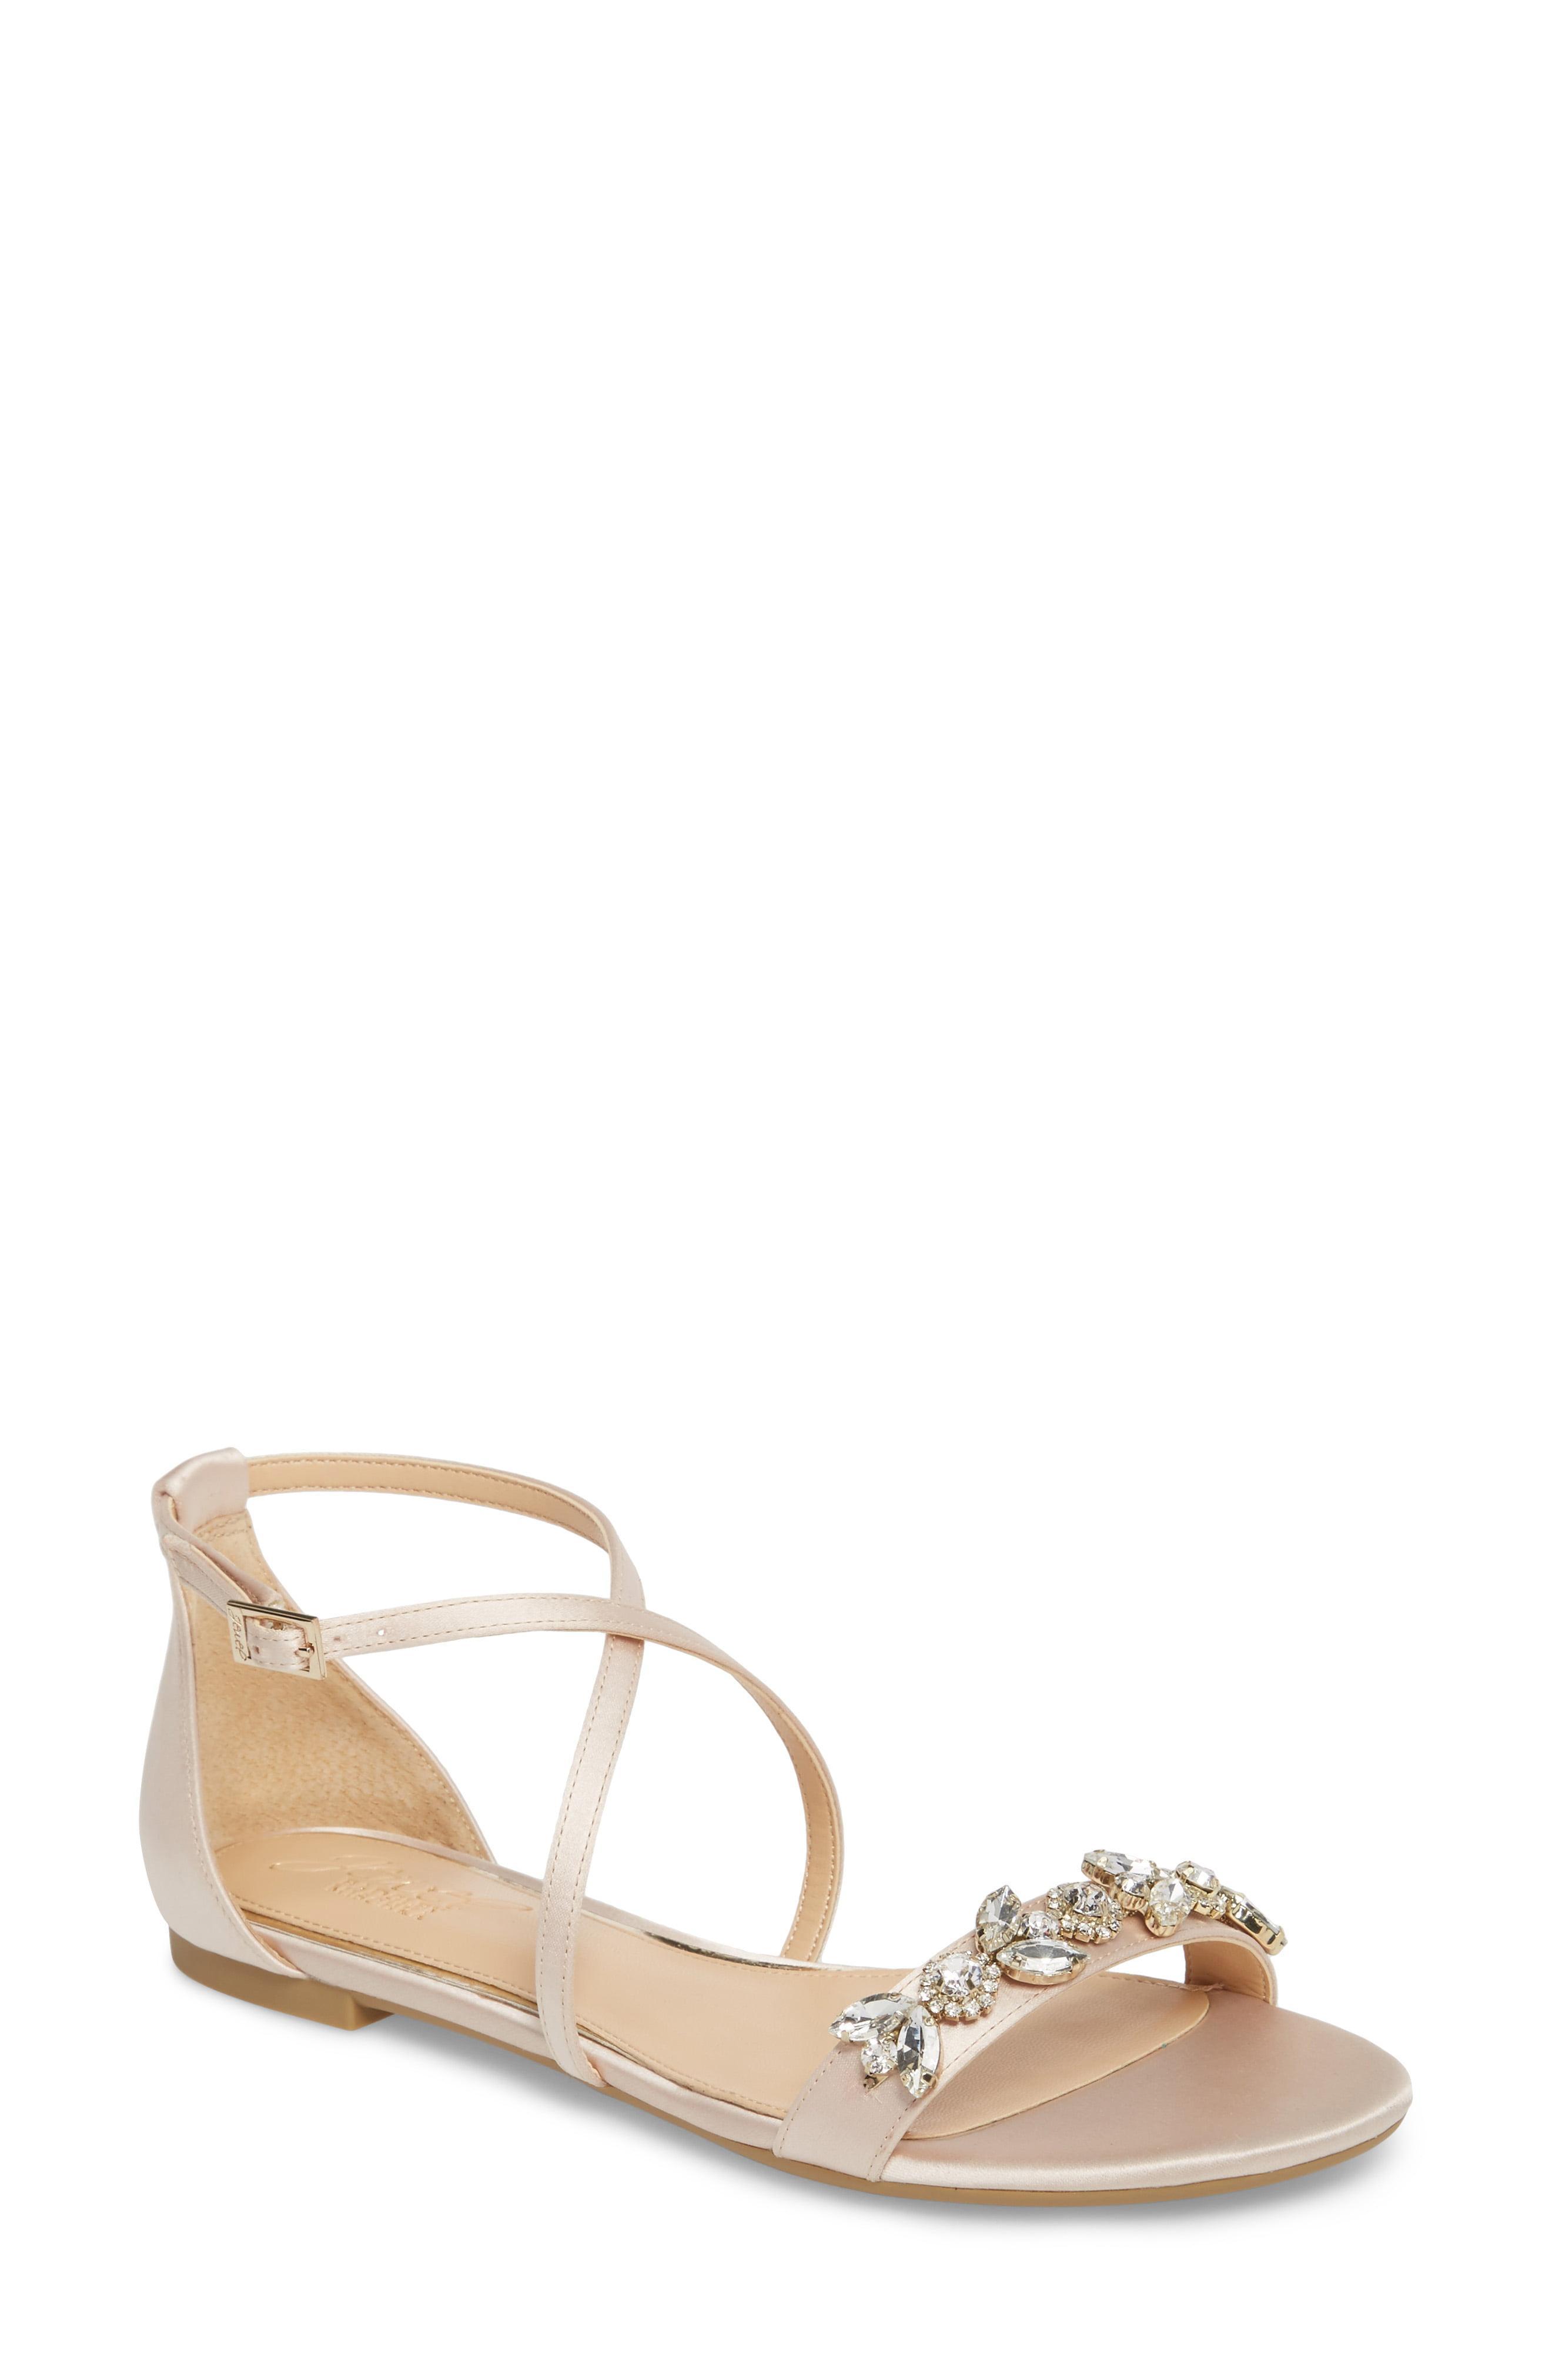 446a518a2 Lyst - Badgley Mischka Tessy Embellished Sandal in Metallic